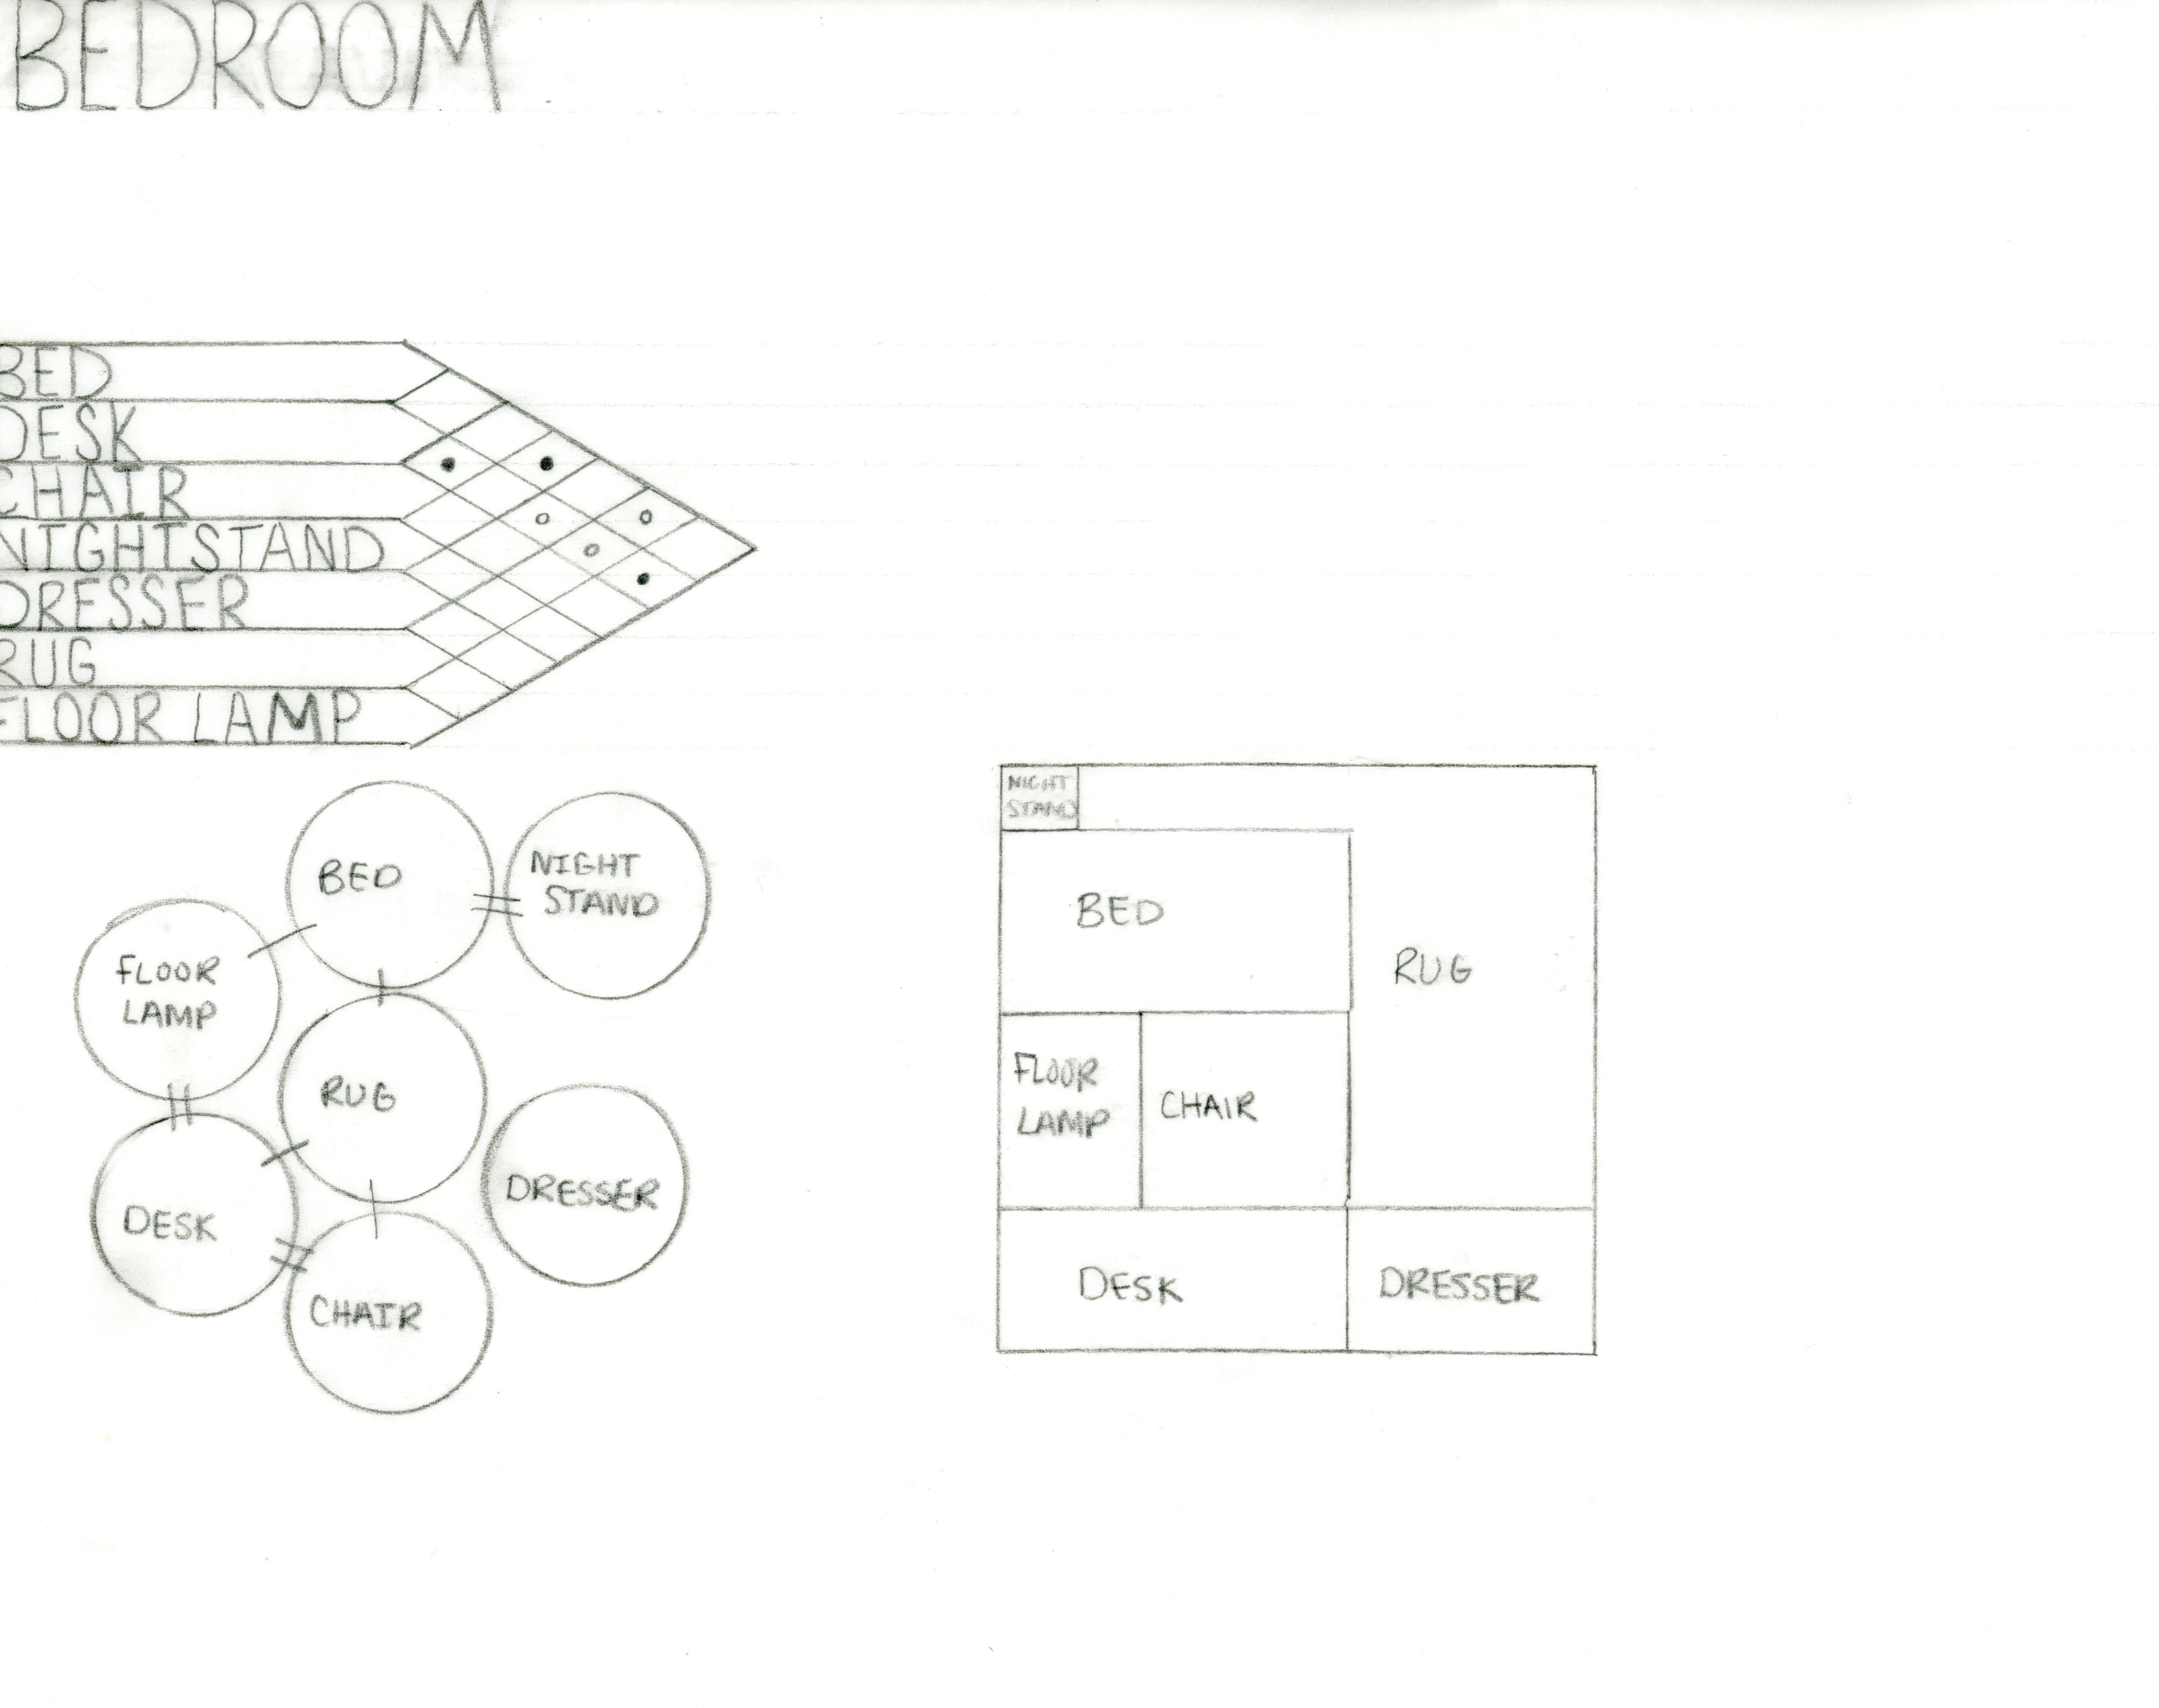 Design Communications- Week 1